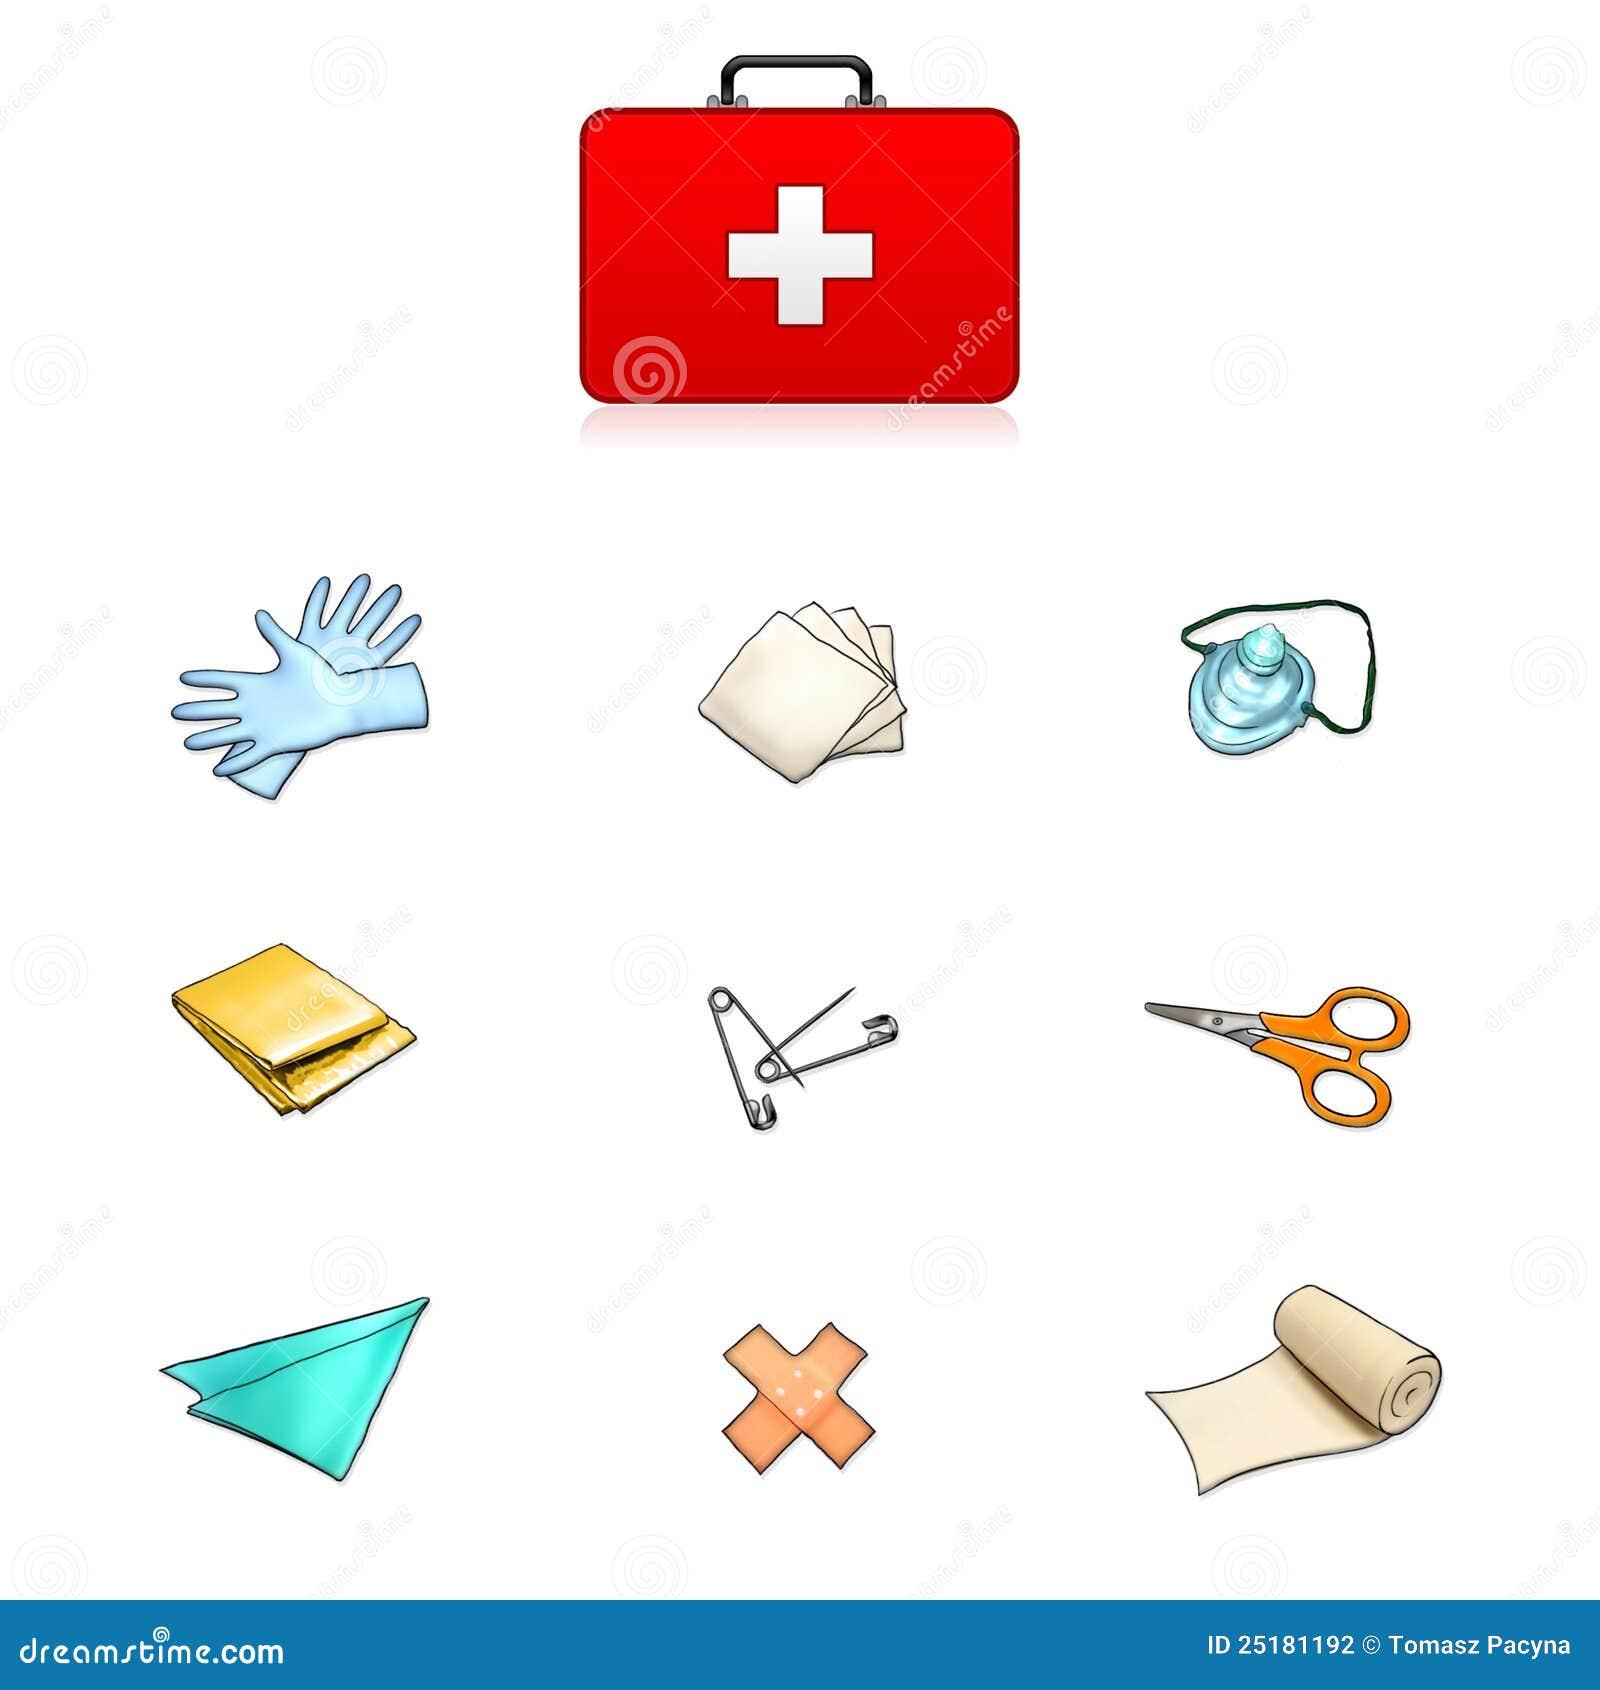 First Aid Kit Illustra...